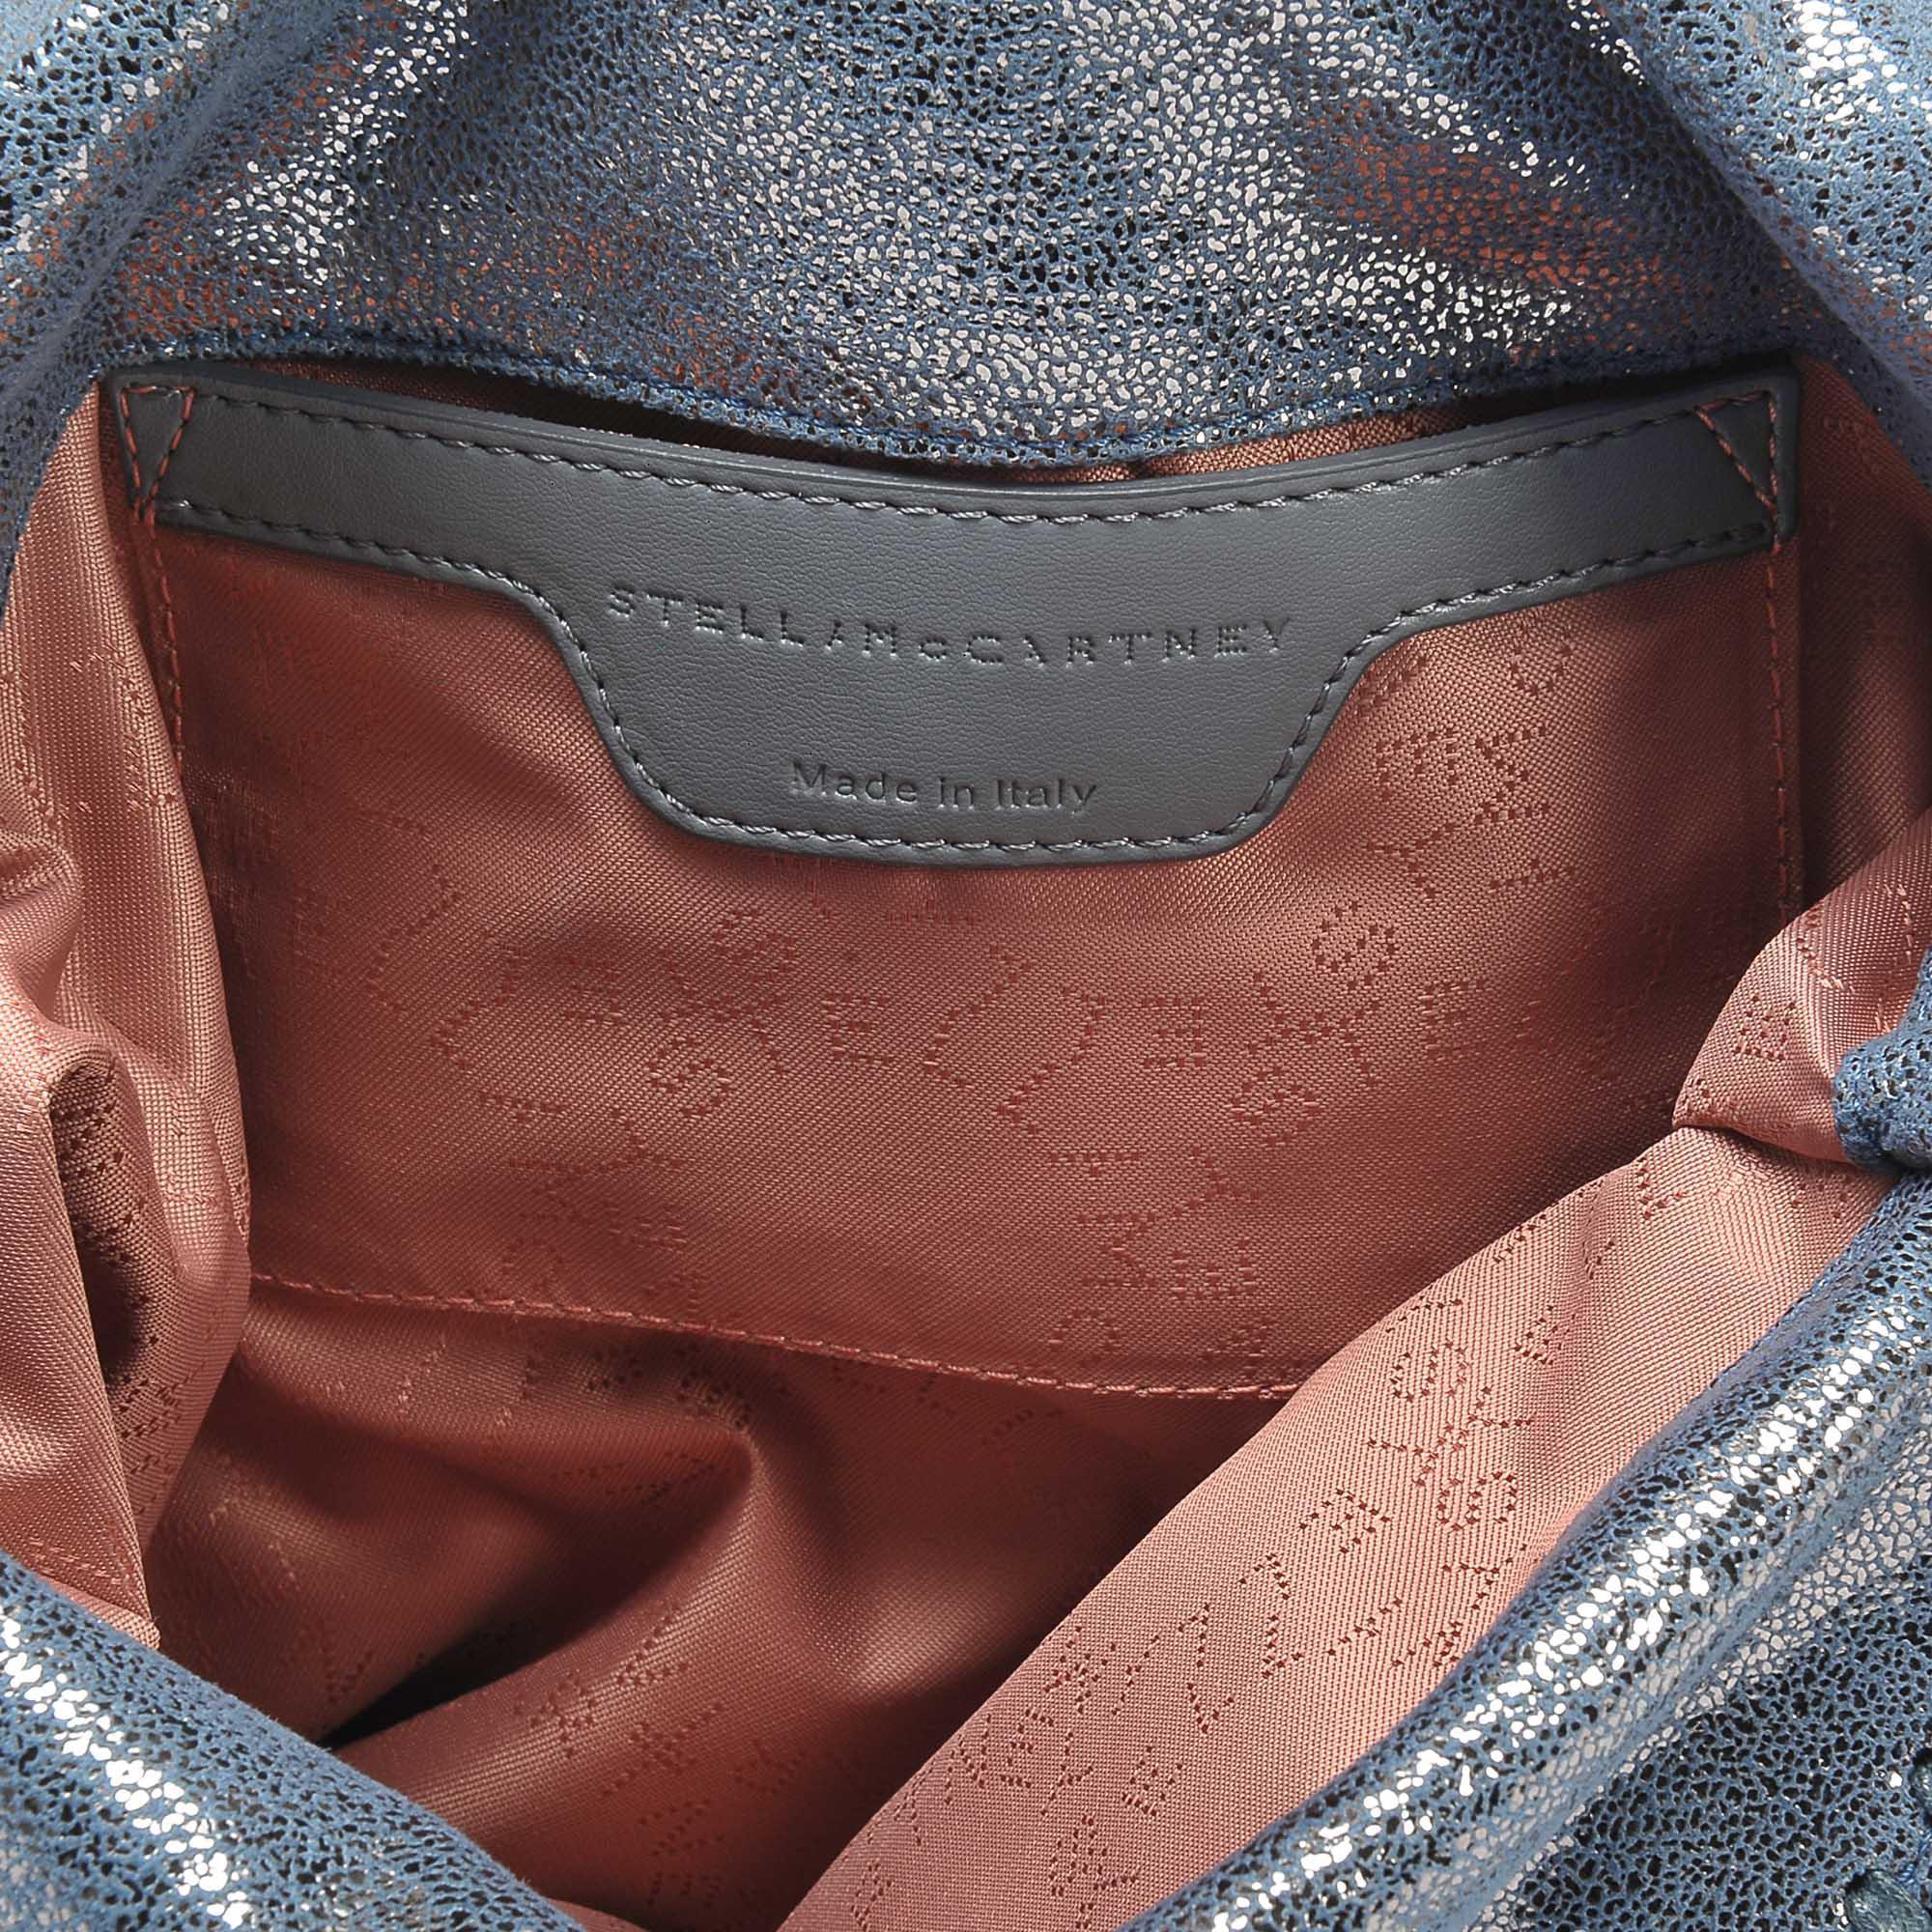 da2ff32152c3 Lyst - Stella McCartney Metallic Shaggy Deer Falabella Mini Tote Bag ...